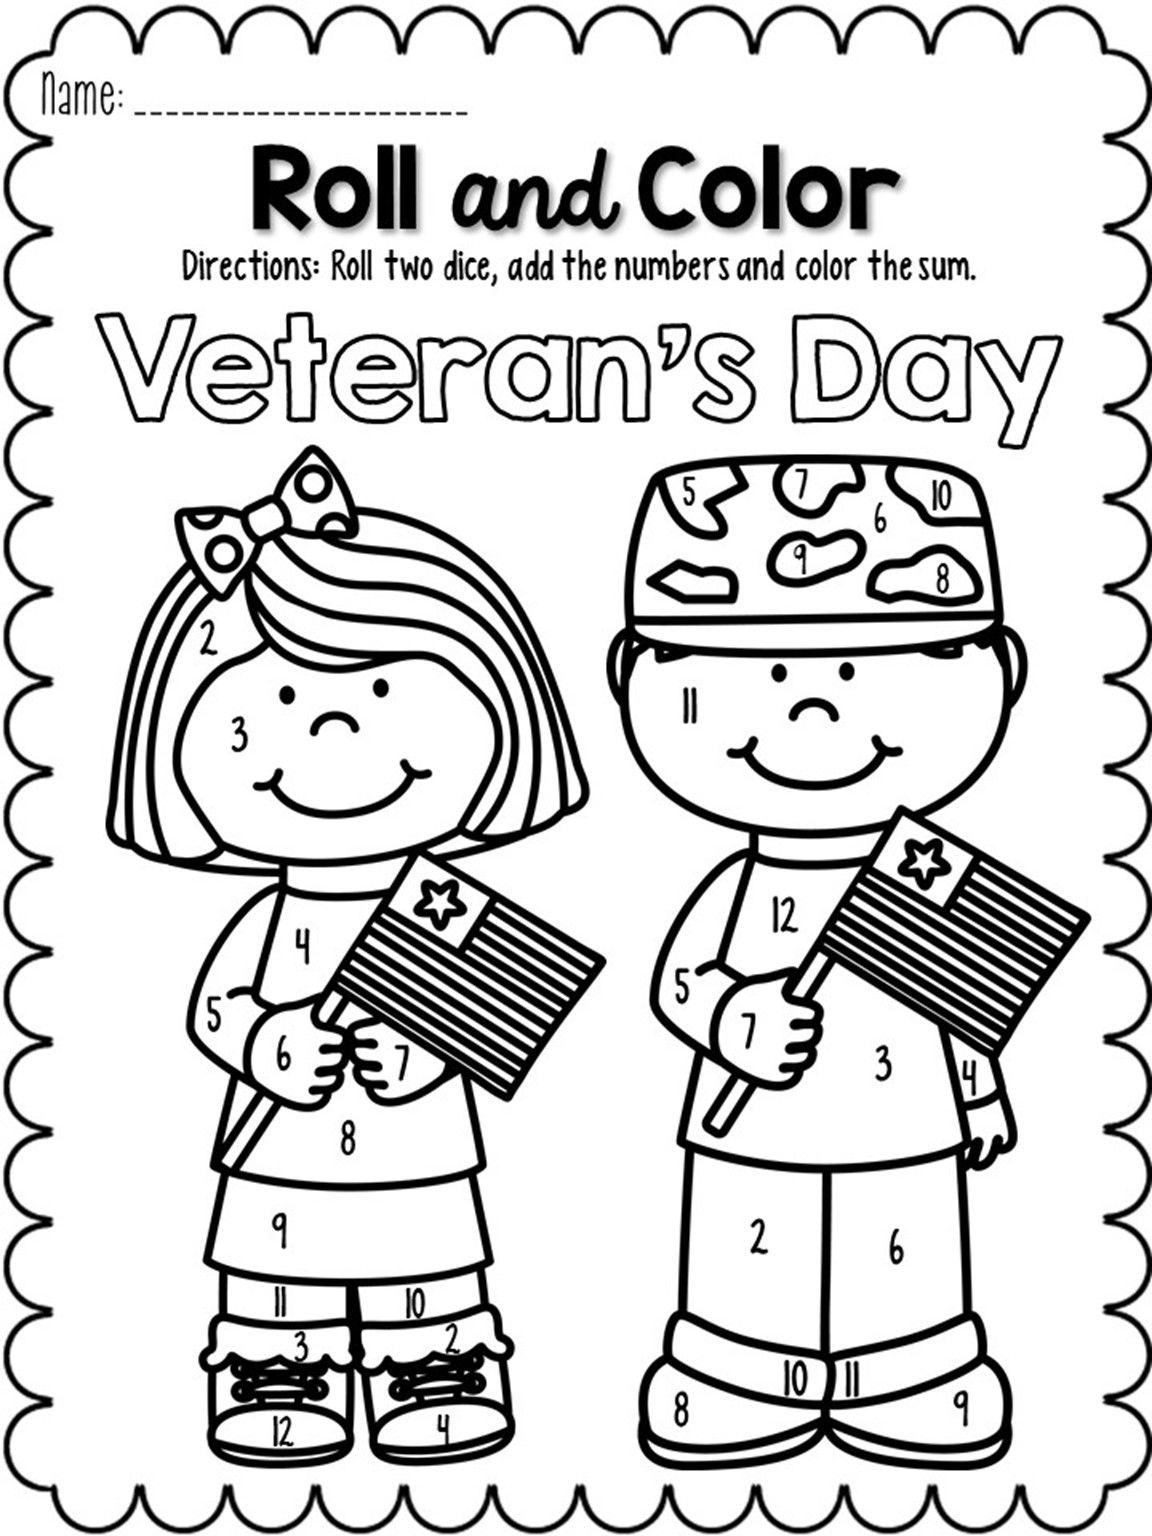 37ac557728b0bc295c5d014d6ec4feed - Veterans Day For Kindergarten